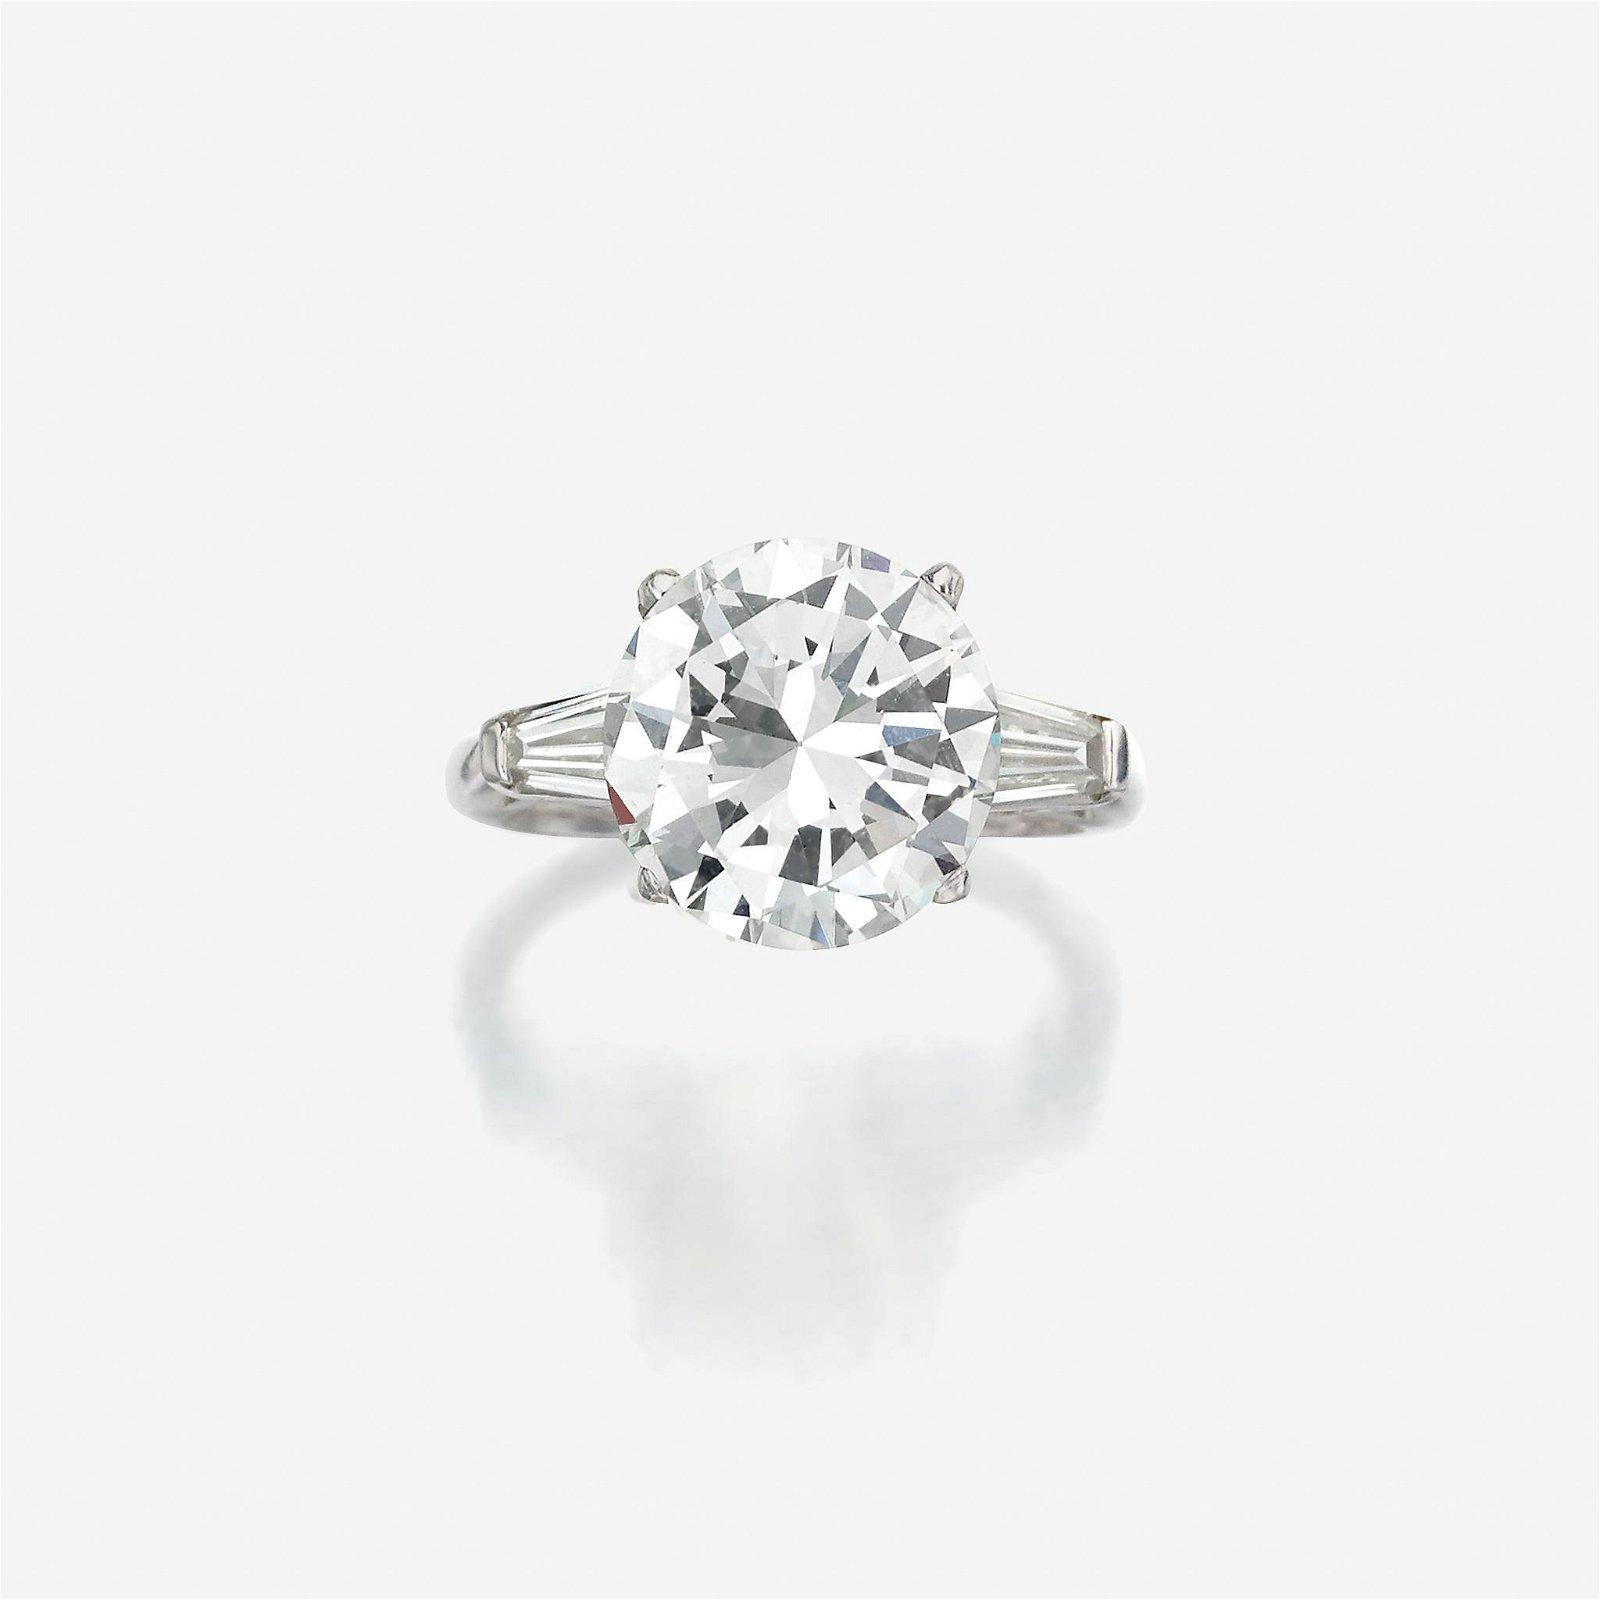 A diamond solitaire,